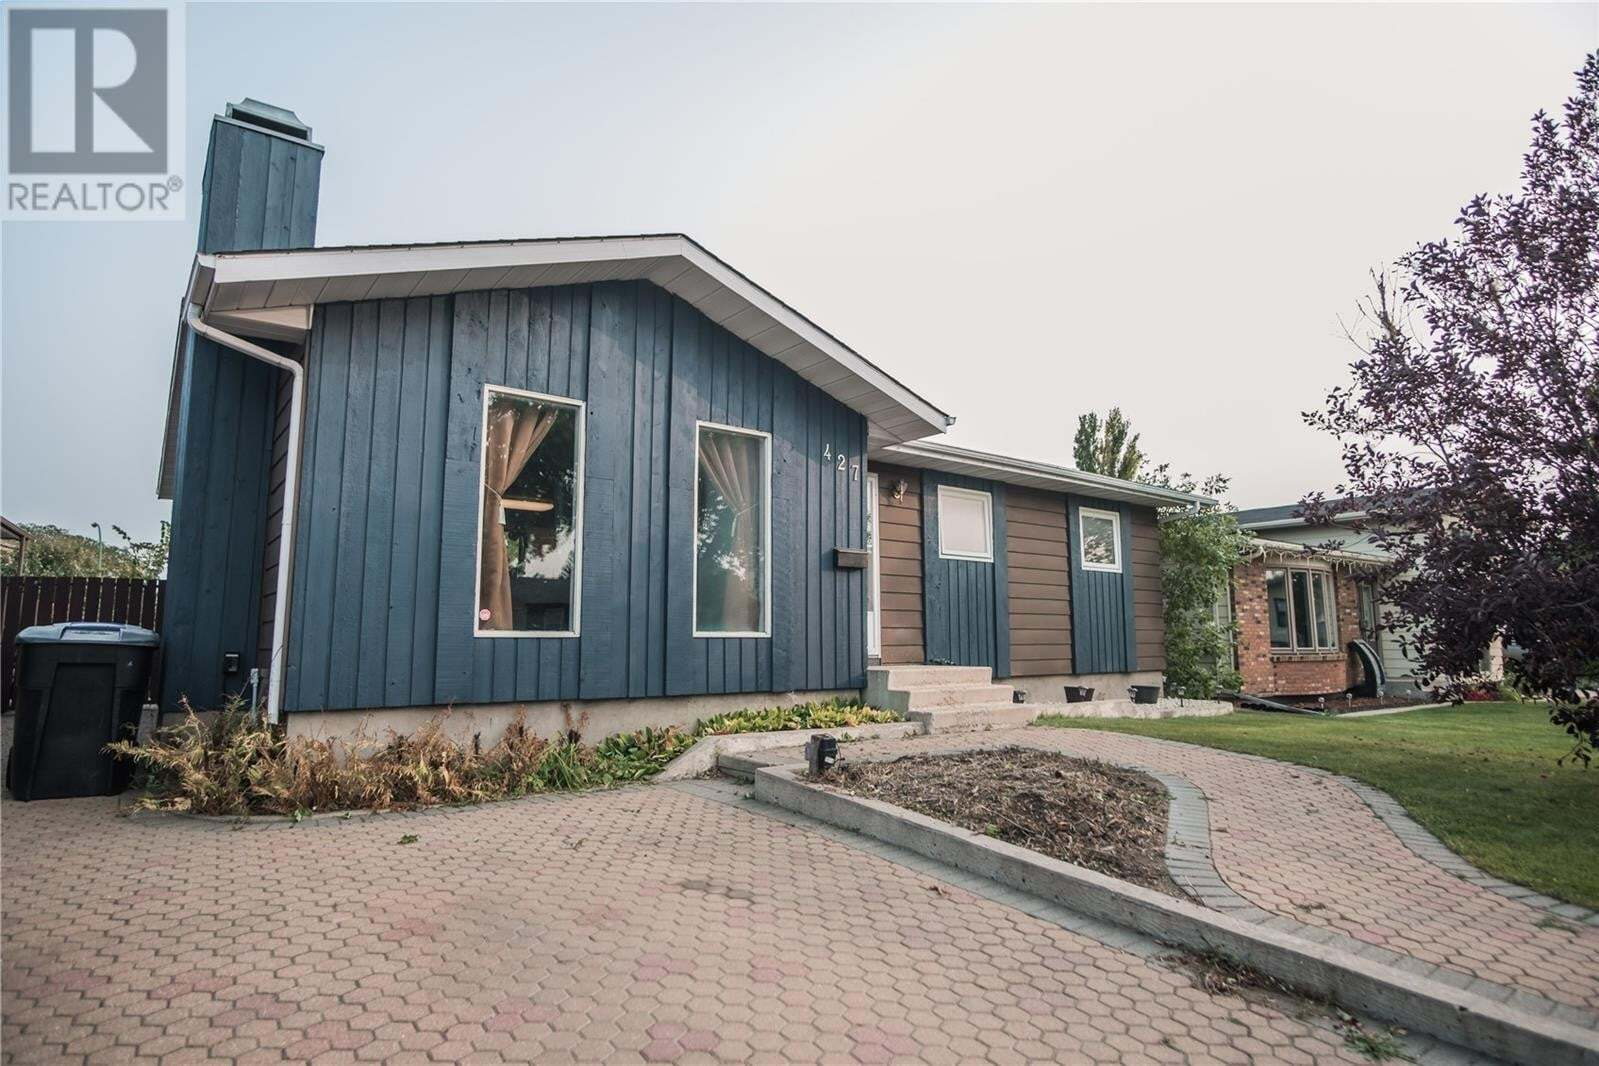 House for sale at 427 Smith Cres Saskatoon Saskatchewan - MLS: SK830337